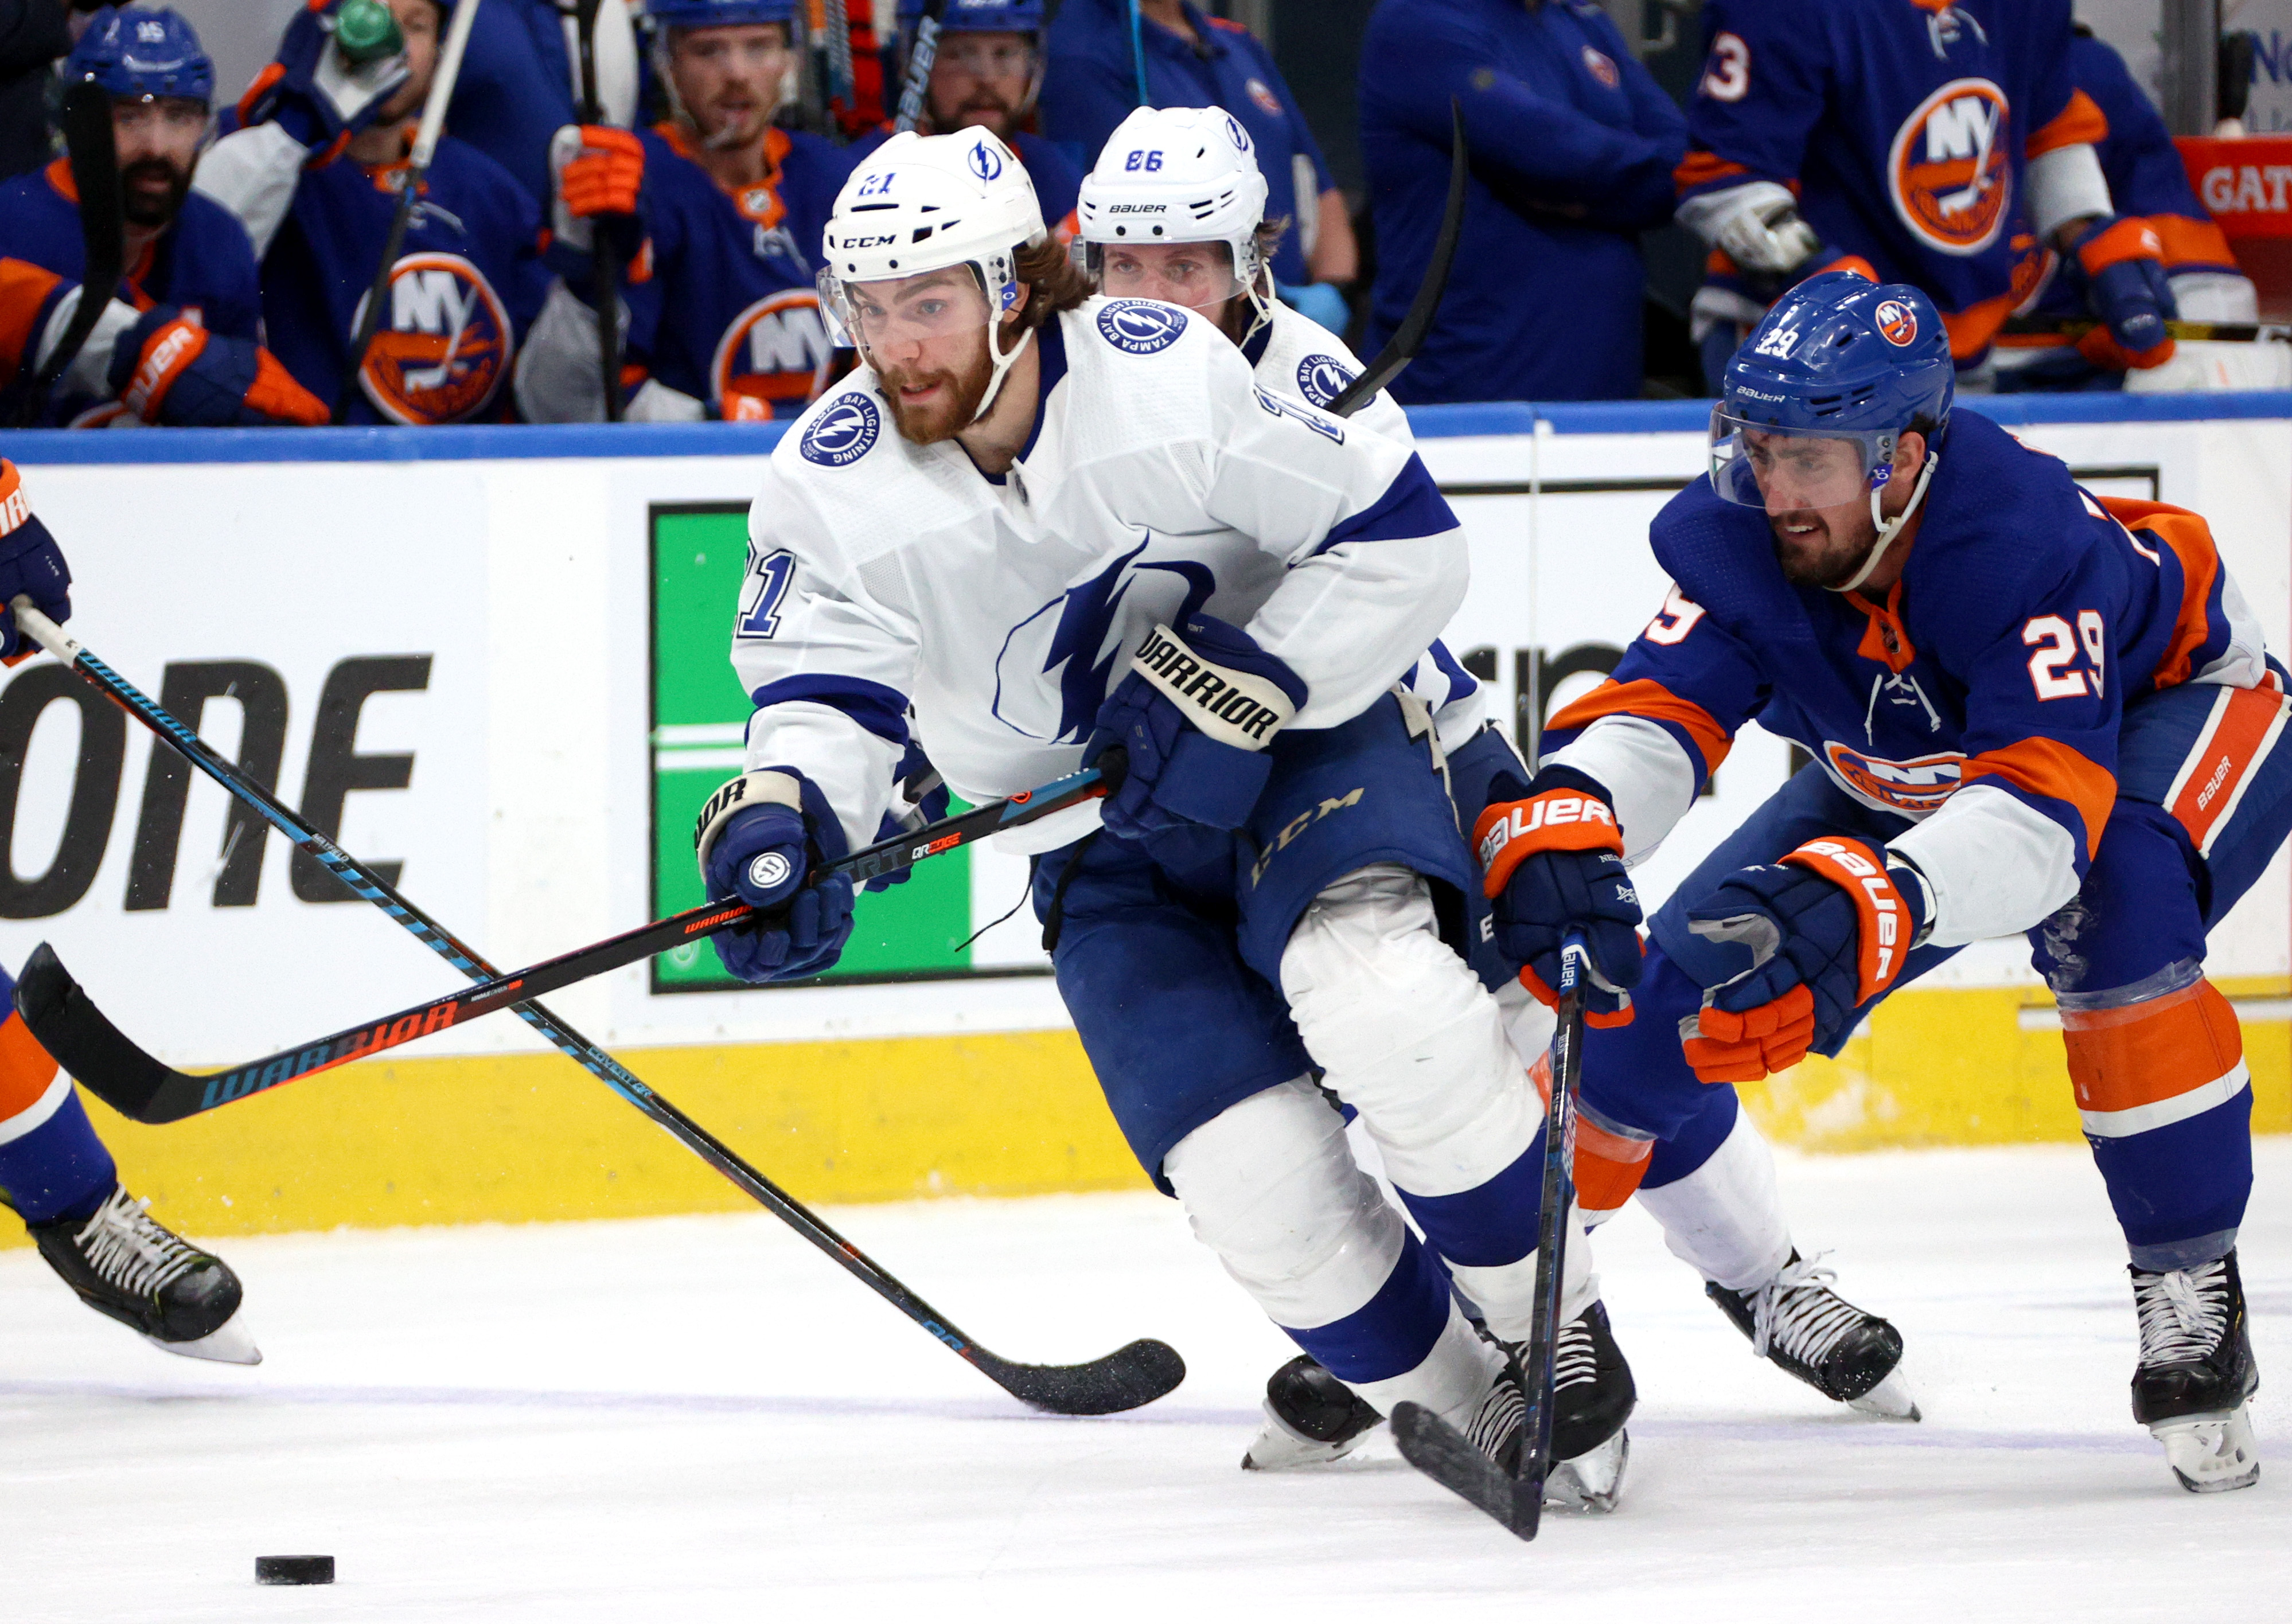 Brayden坦帕湾闪电的溜冰鞋的冰球作为纽约的布鲁克·尼尔森岛民奉行在第三段游戏6东部决赛的2020 NHL斯坦利杯季后赛坦帕湾闪电和纽约之间的岛民在罗杰斯地方9月17日,2020年在阿尔伯塔省埃德蒙顿。